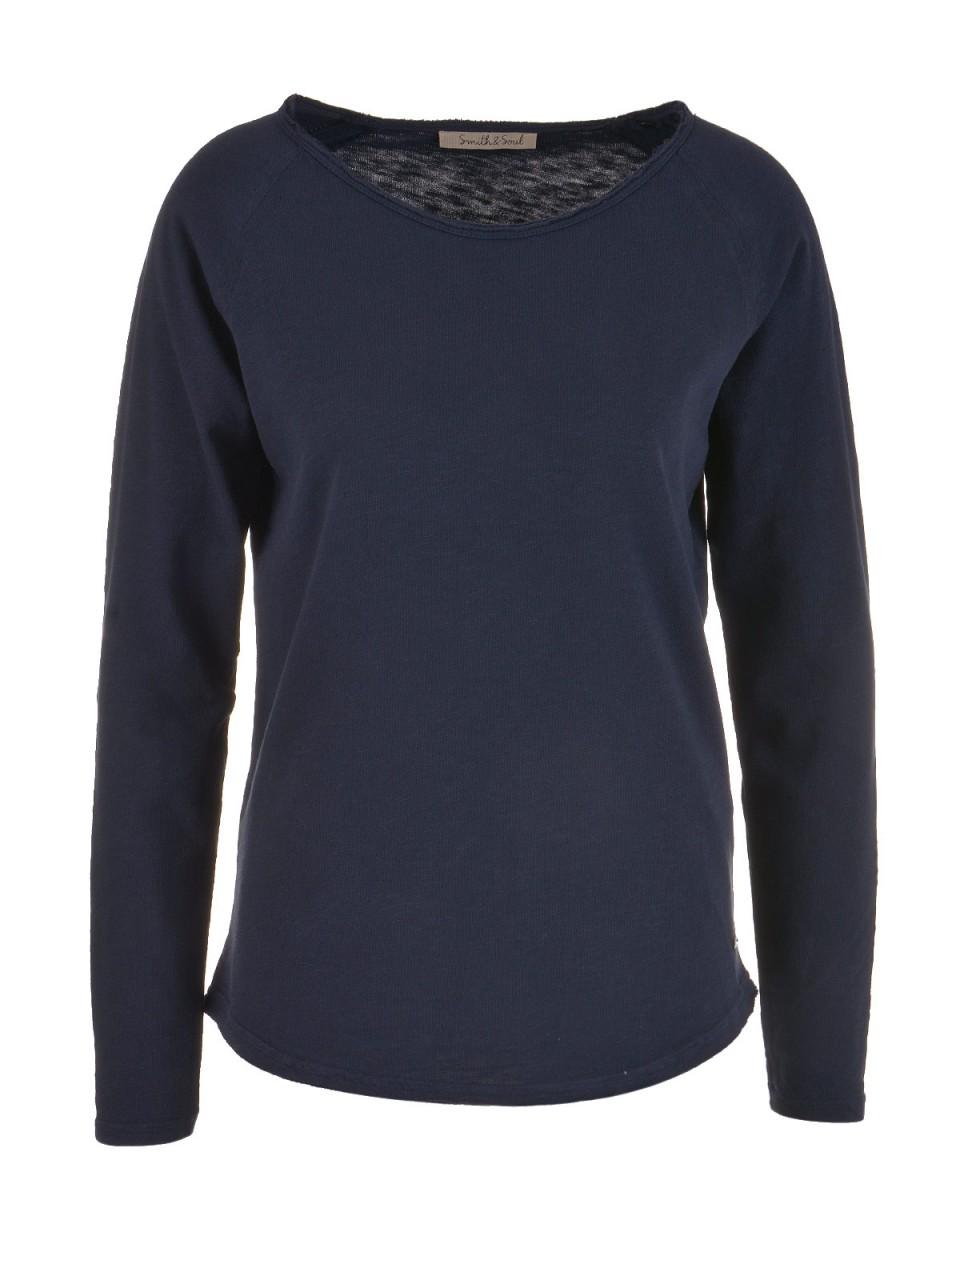 smith-amp-soul-damen-sweatshirt-navy